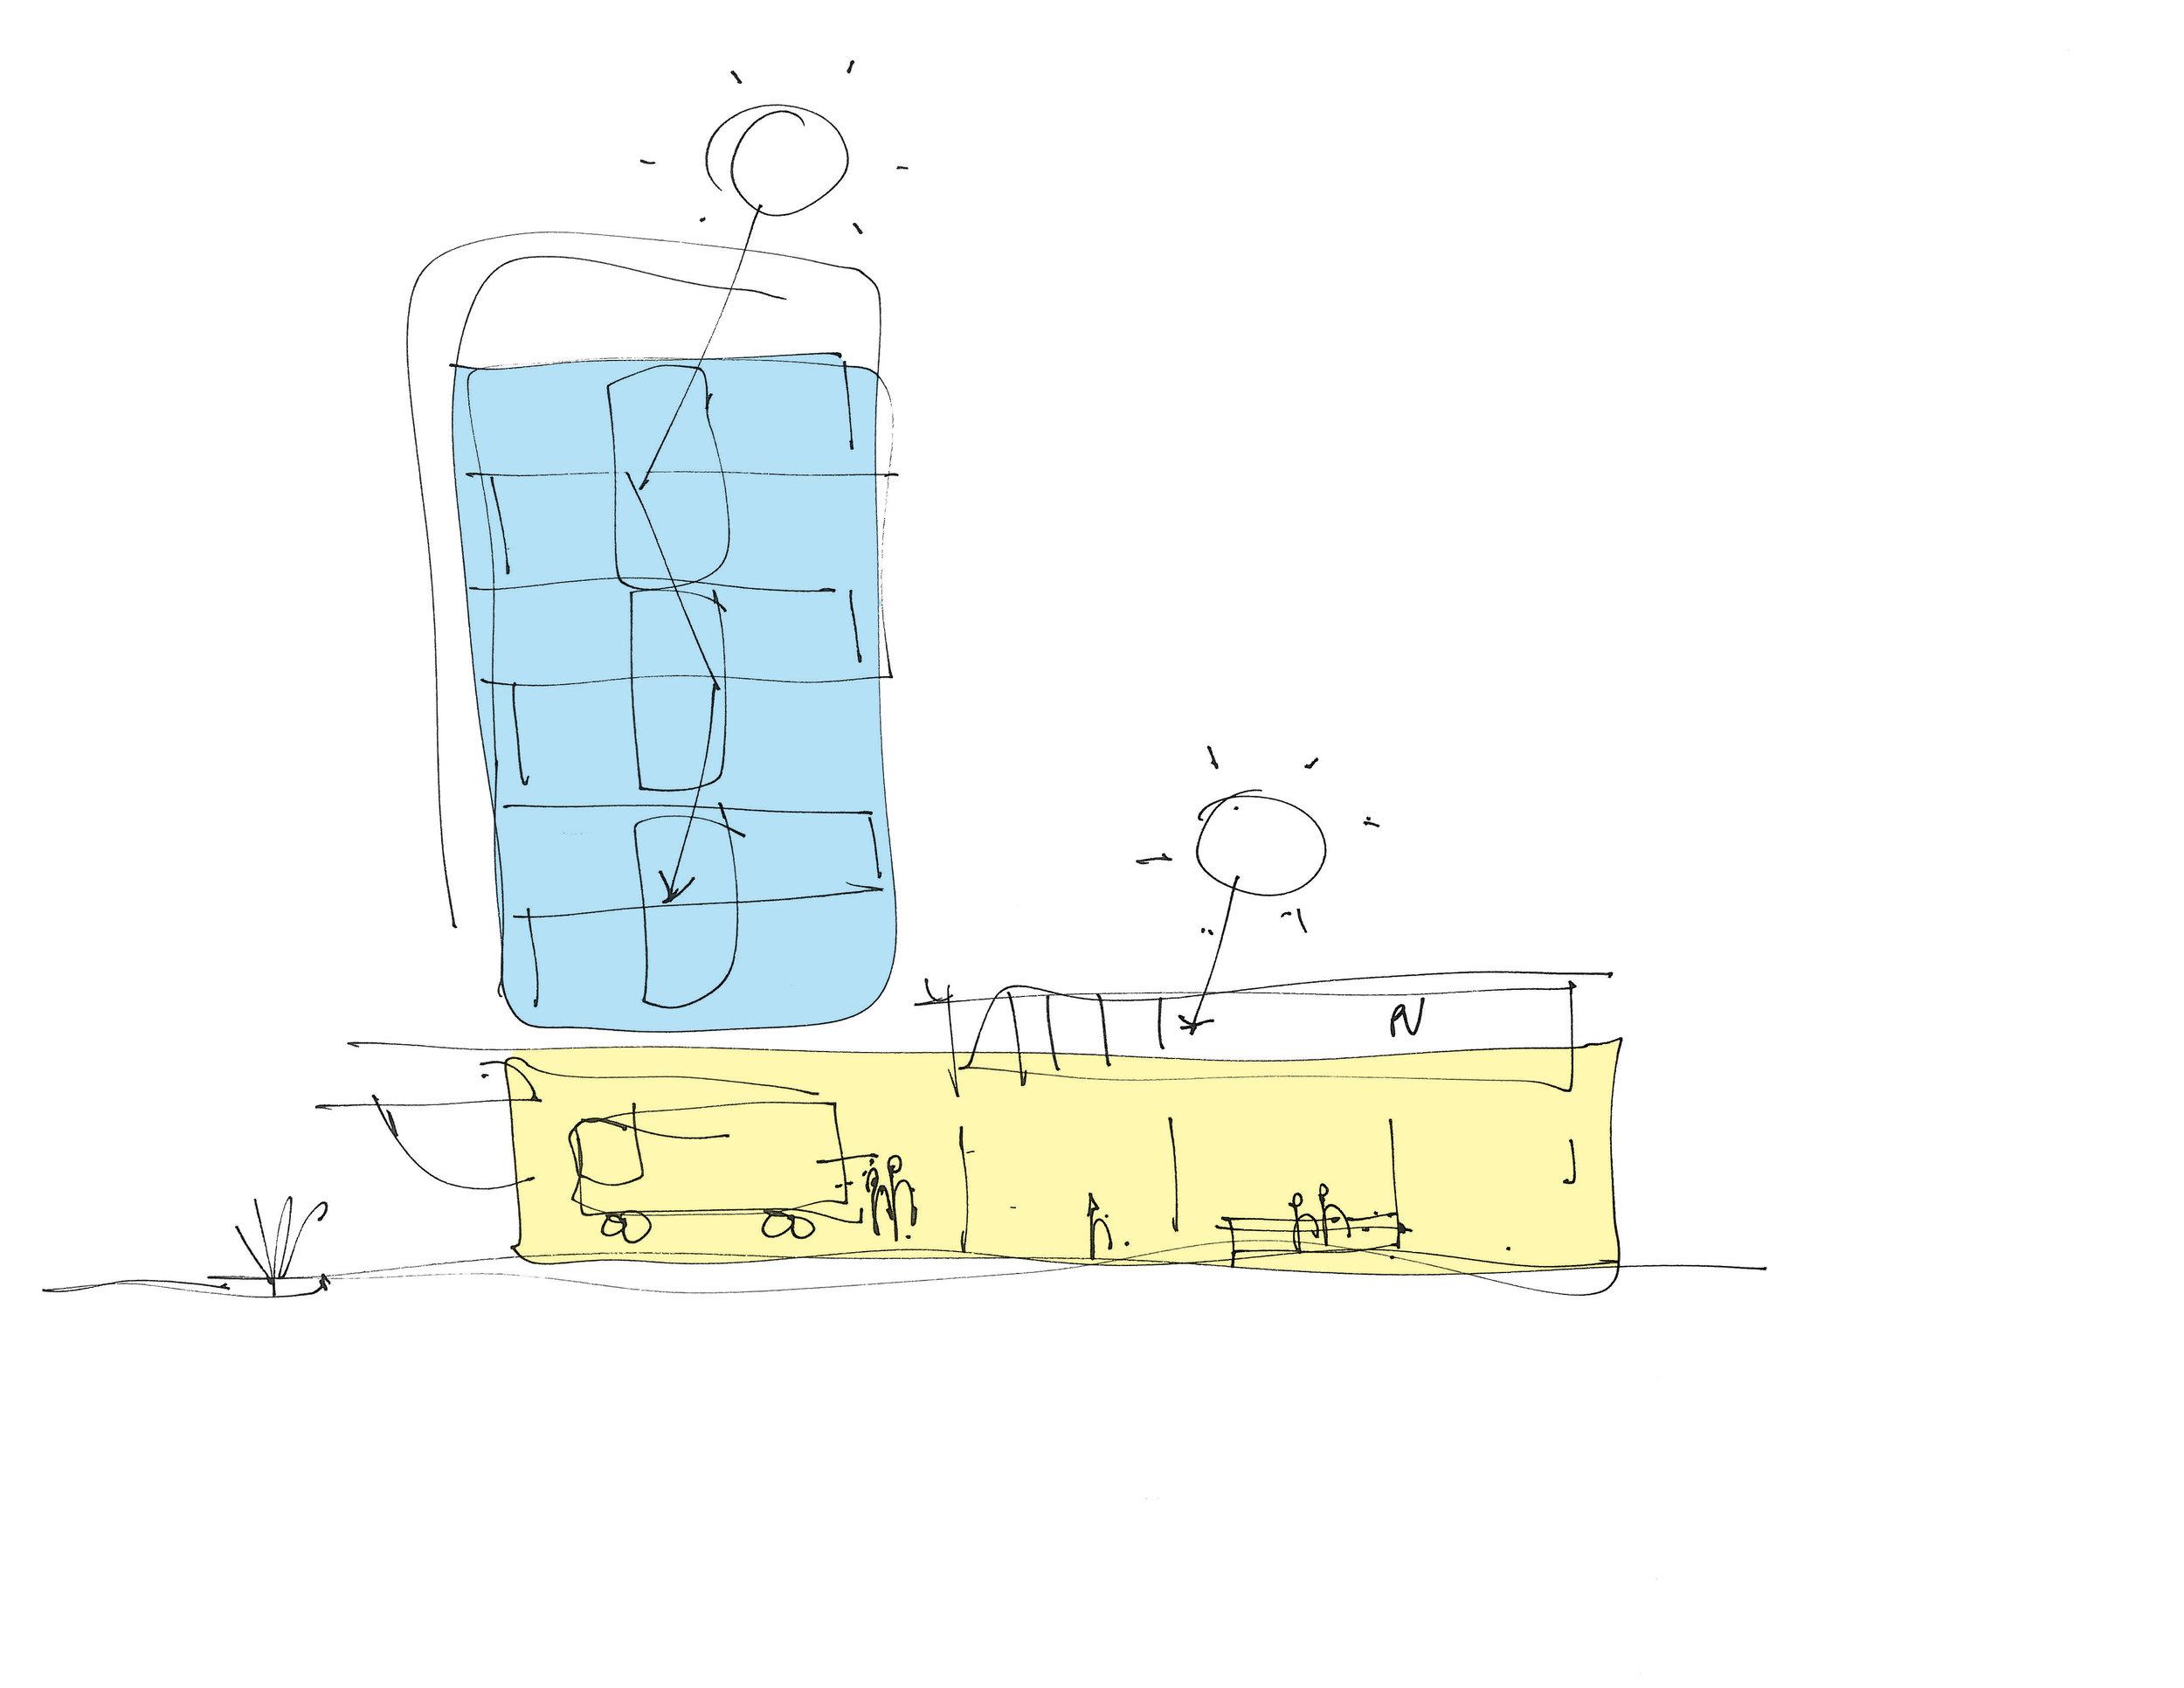 sketch_concept.jpg